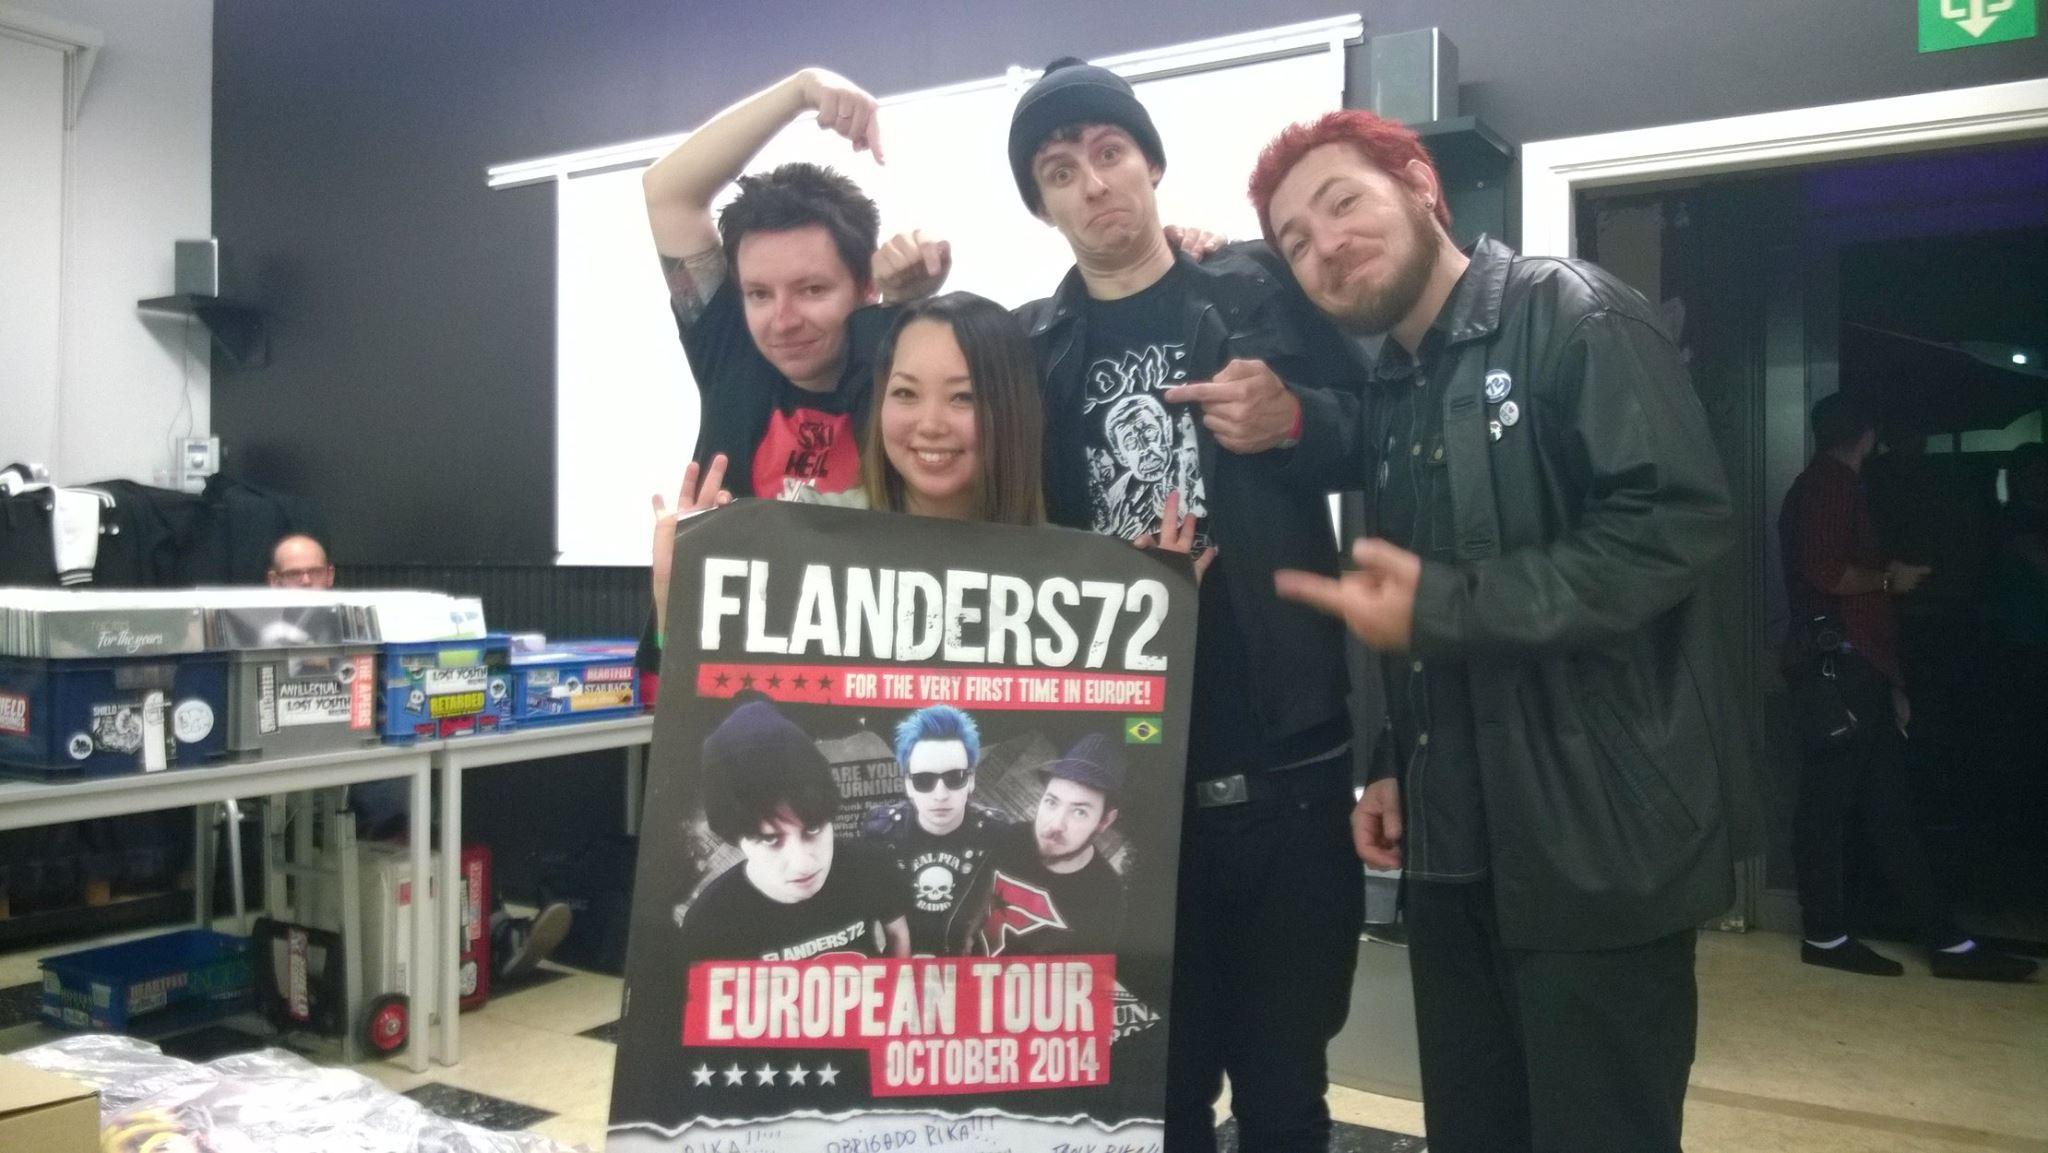 flanders_72_tour_europa (5)